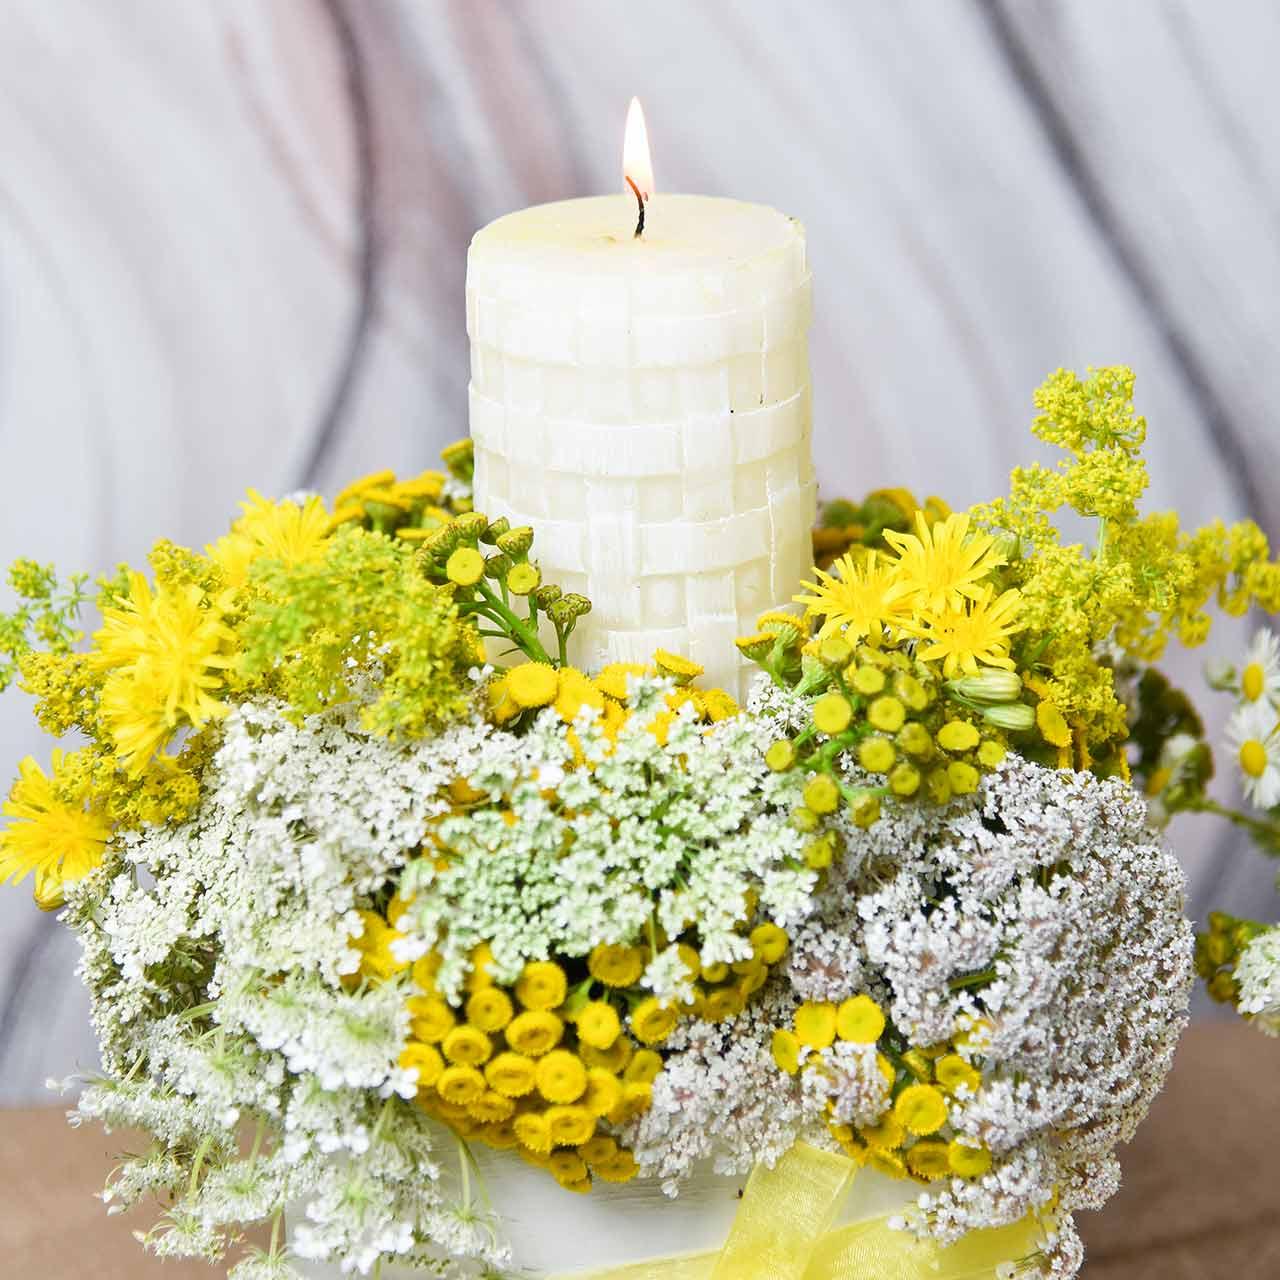 Rustieke kaarsen, witte waskaarsen, stompkaarsen mandpatroon 110/65 2st